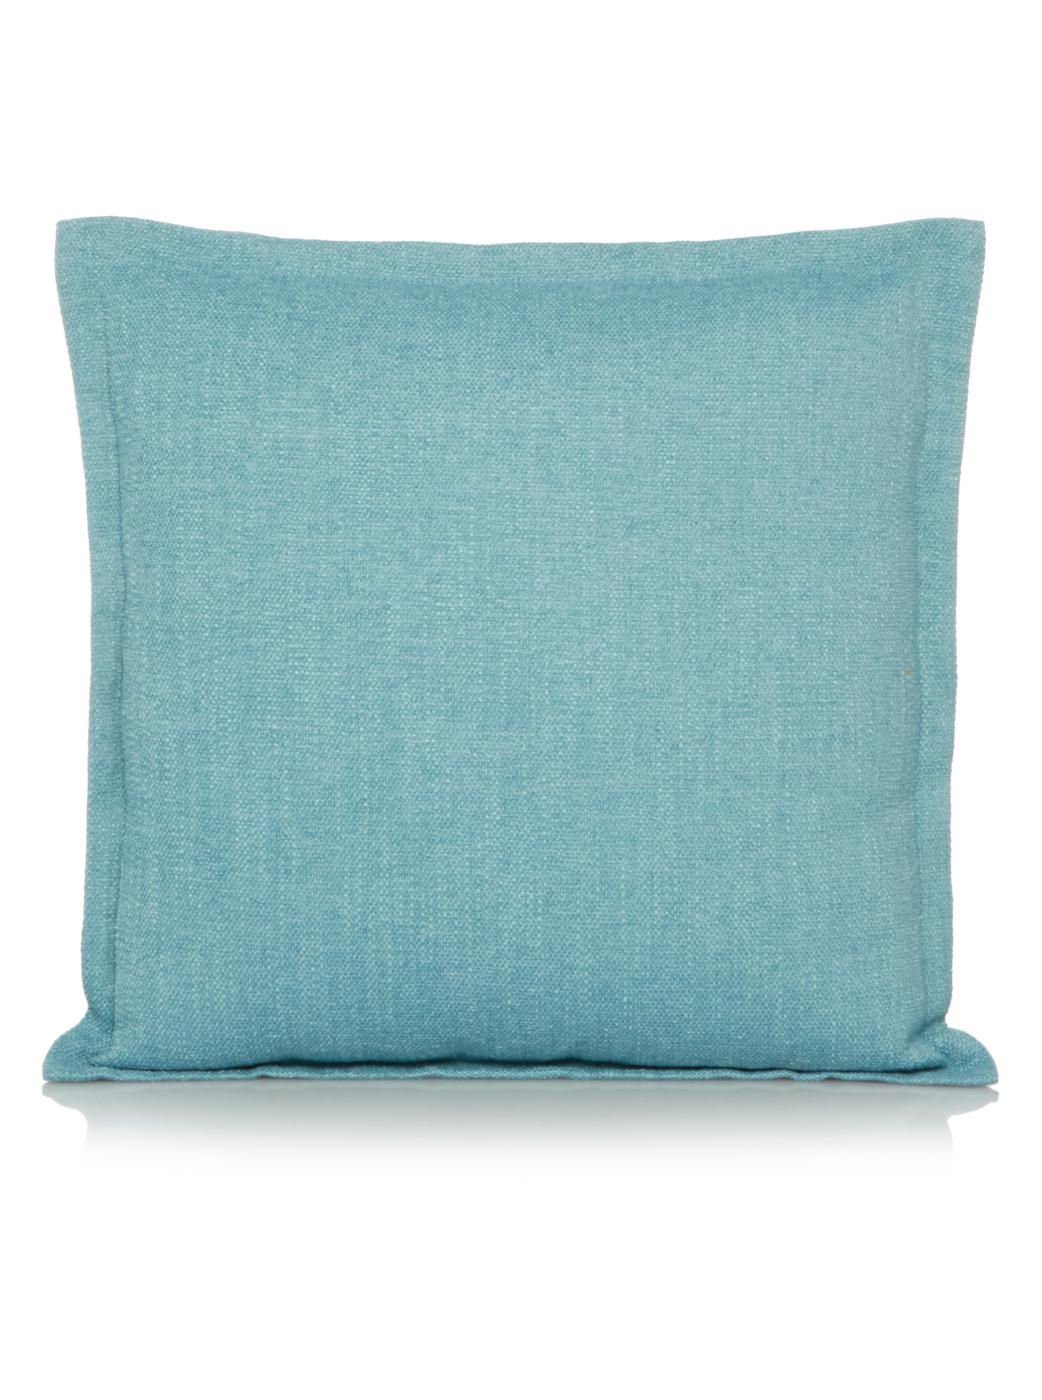 Textured Teal Range Cushions